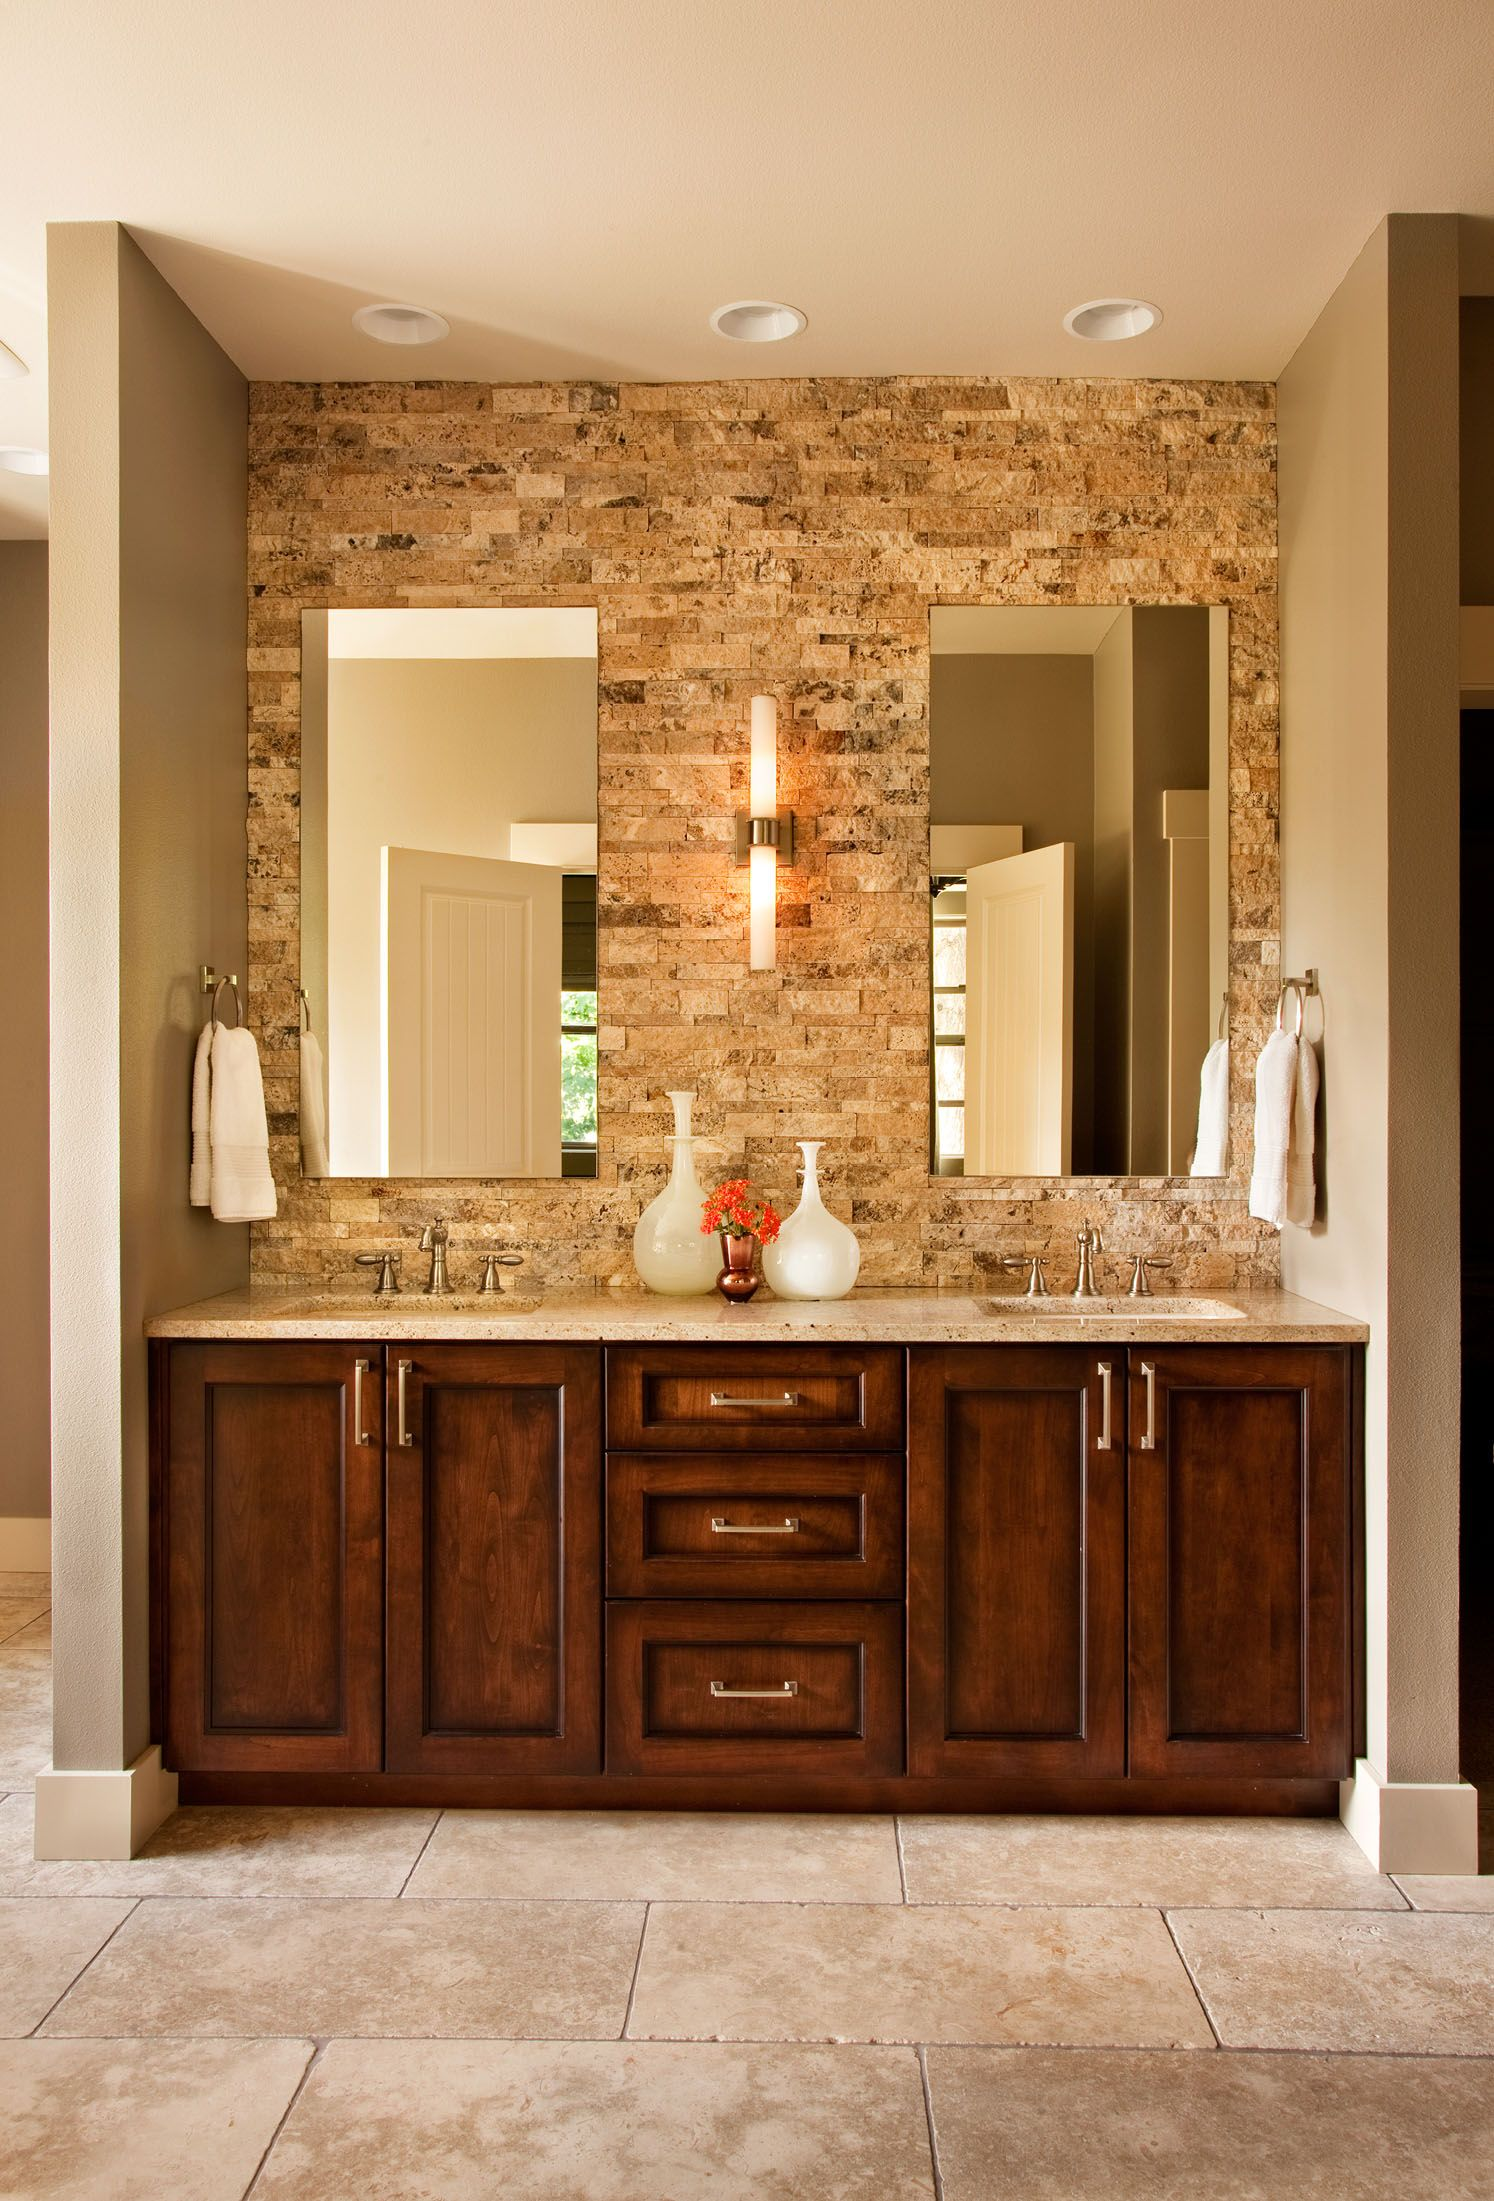 17 Best images about bath rooms on Pinterest. Bathroom cabinet designs photos